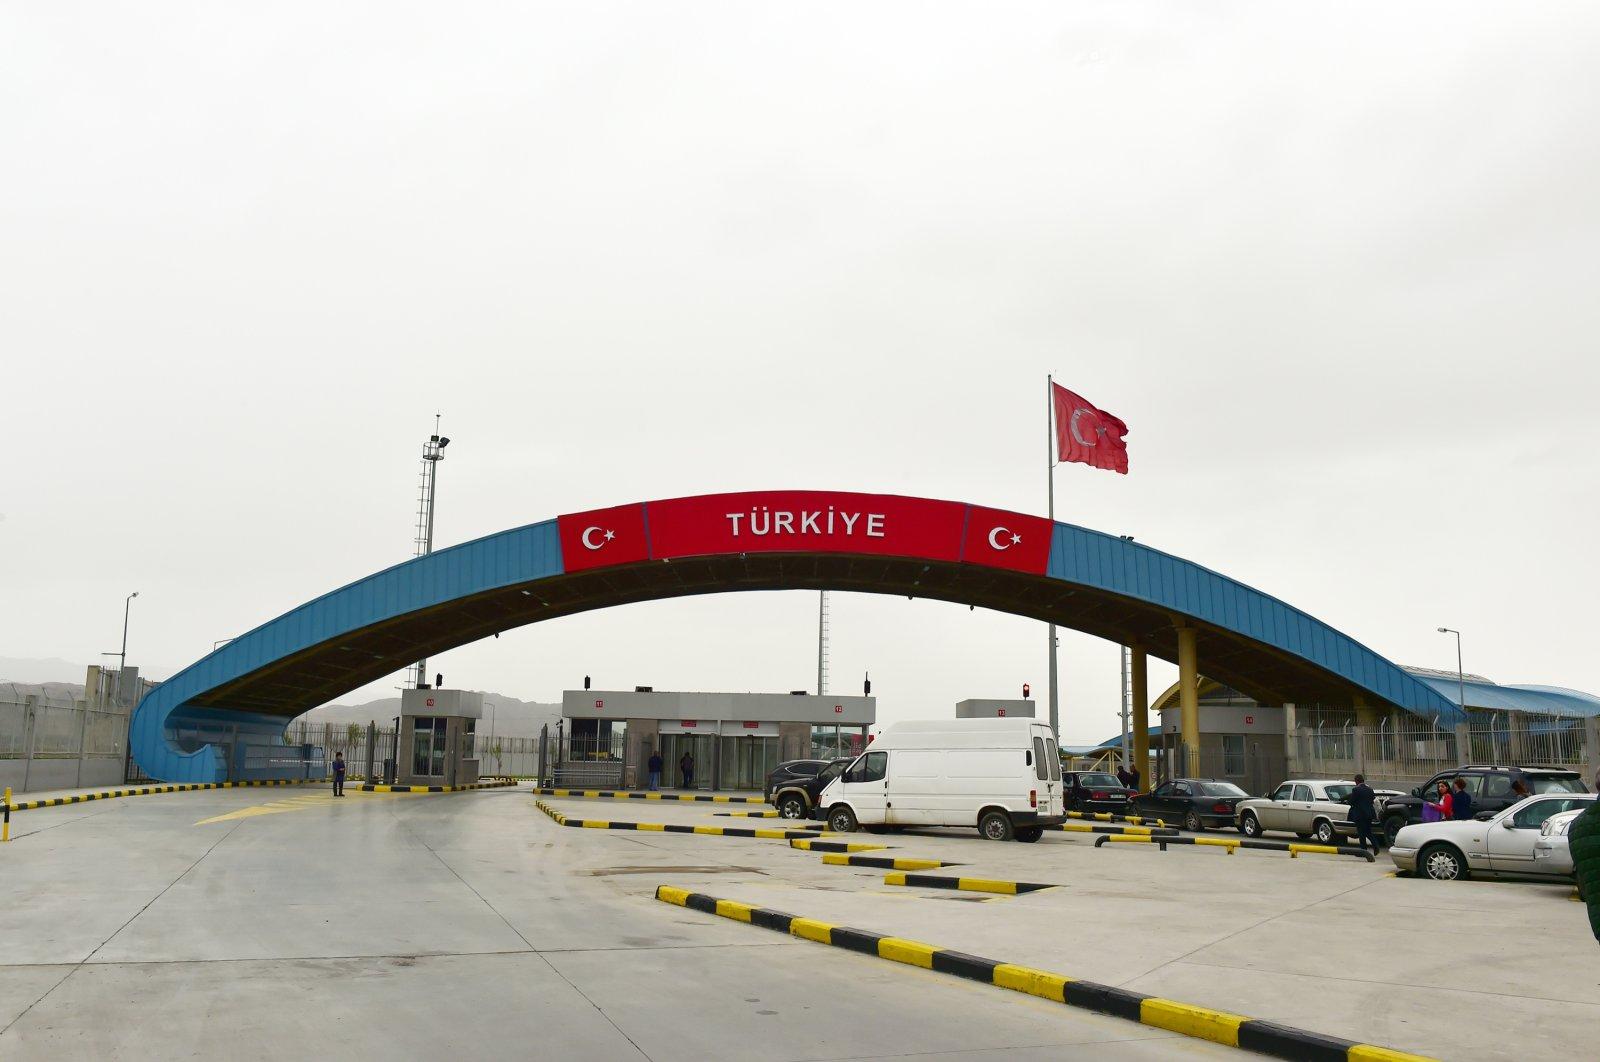 The Dilucu border gate between Nakhchivan and Turkey, in Iğdır, Turkey, May 21, 2017. (Shutterstock)